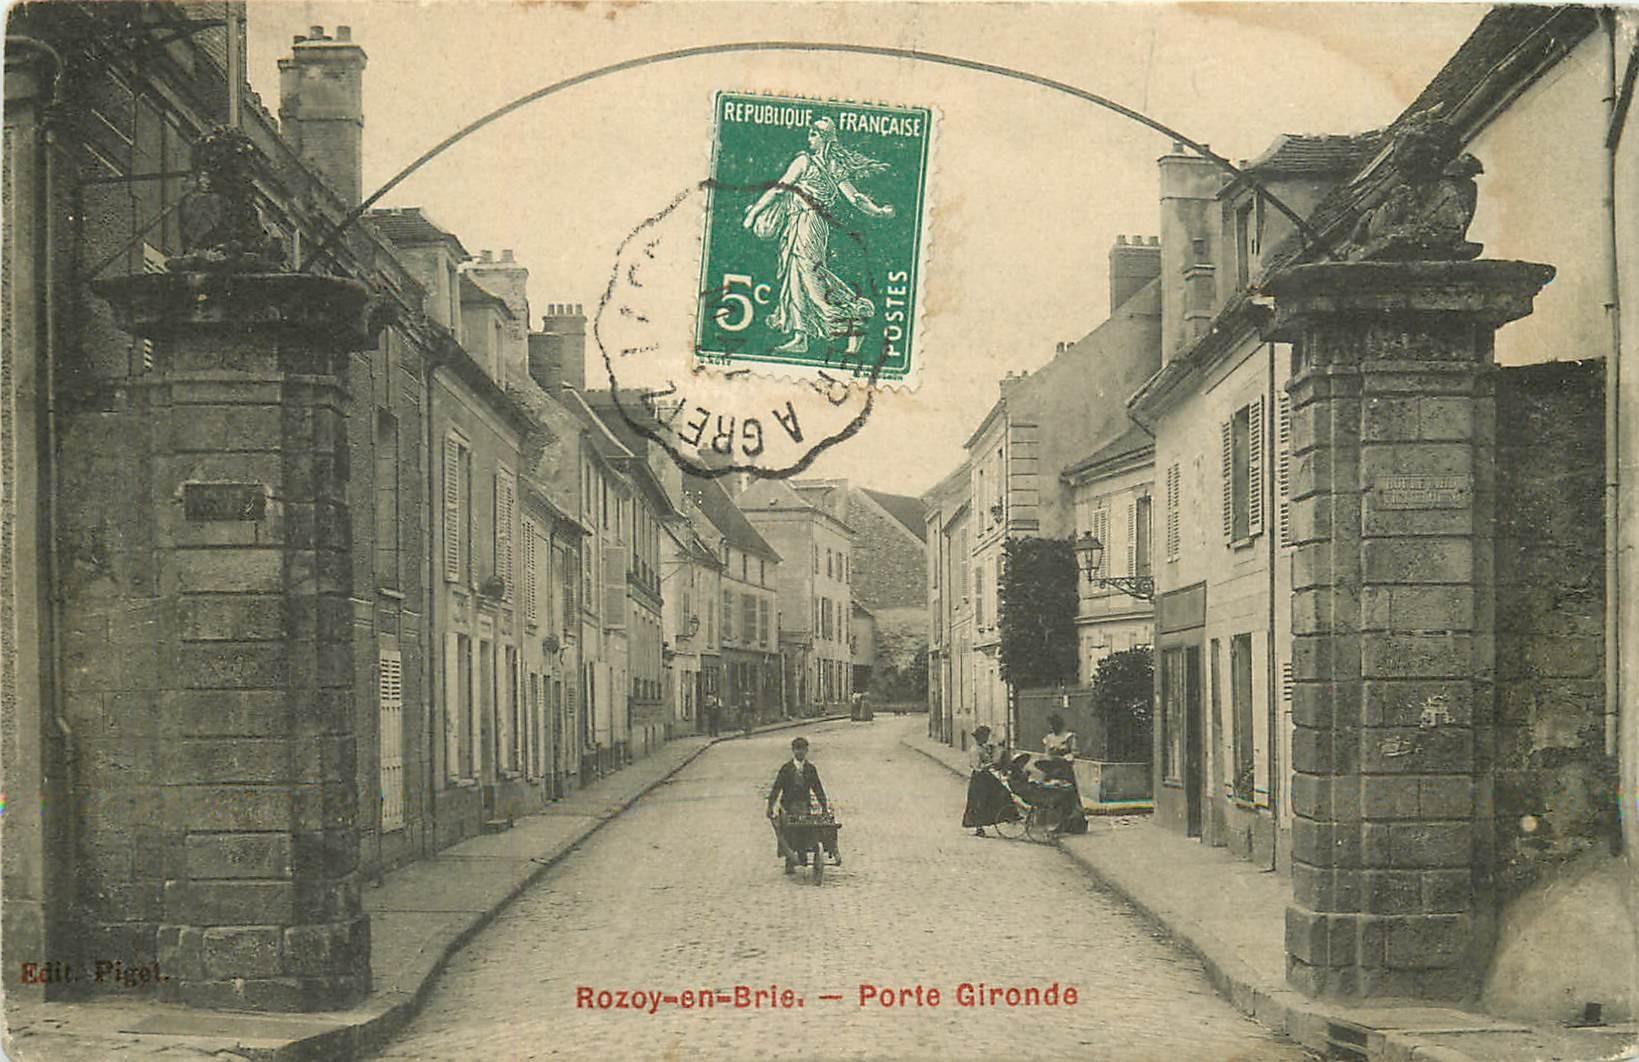 77 ROZOY ROZAY-EN-BRIE. Porte Gironde